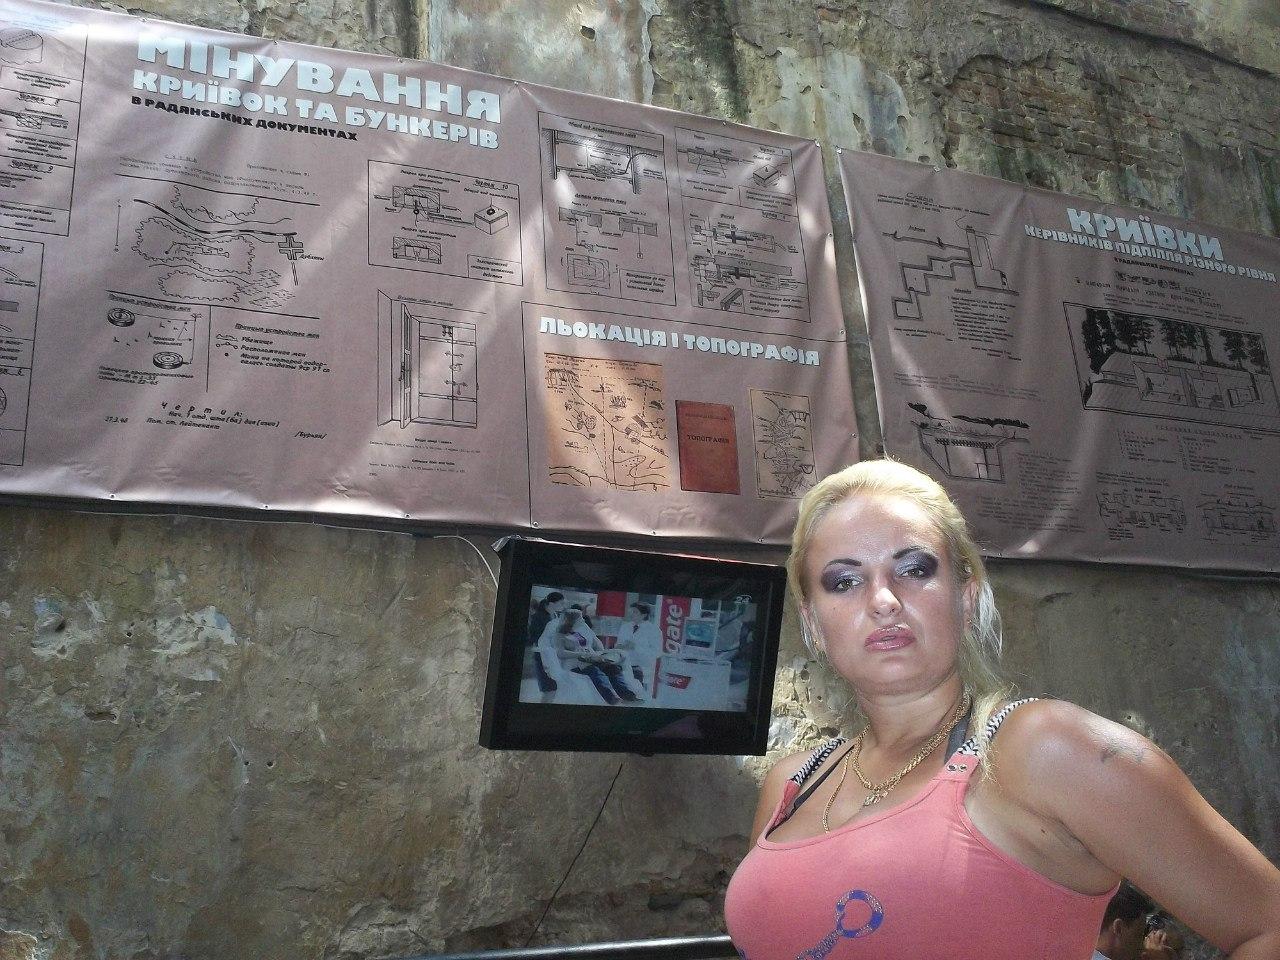 Елена Руденко.Украина. Львов. Лето 2012. ( фото ) ZfxpvqwL9oA